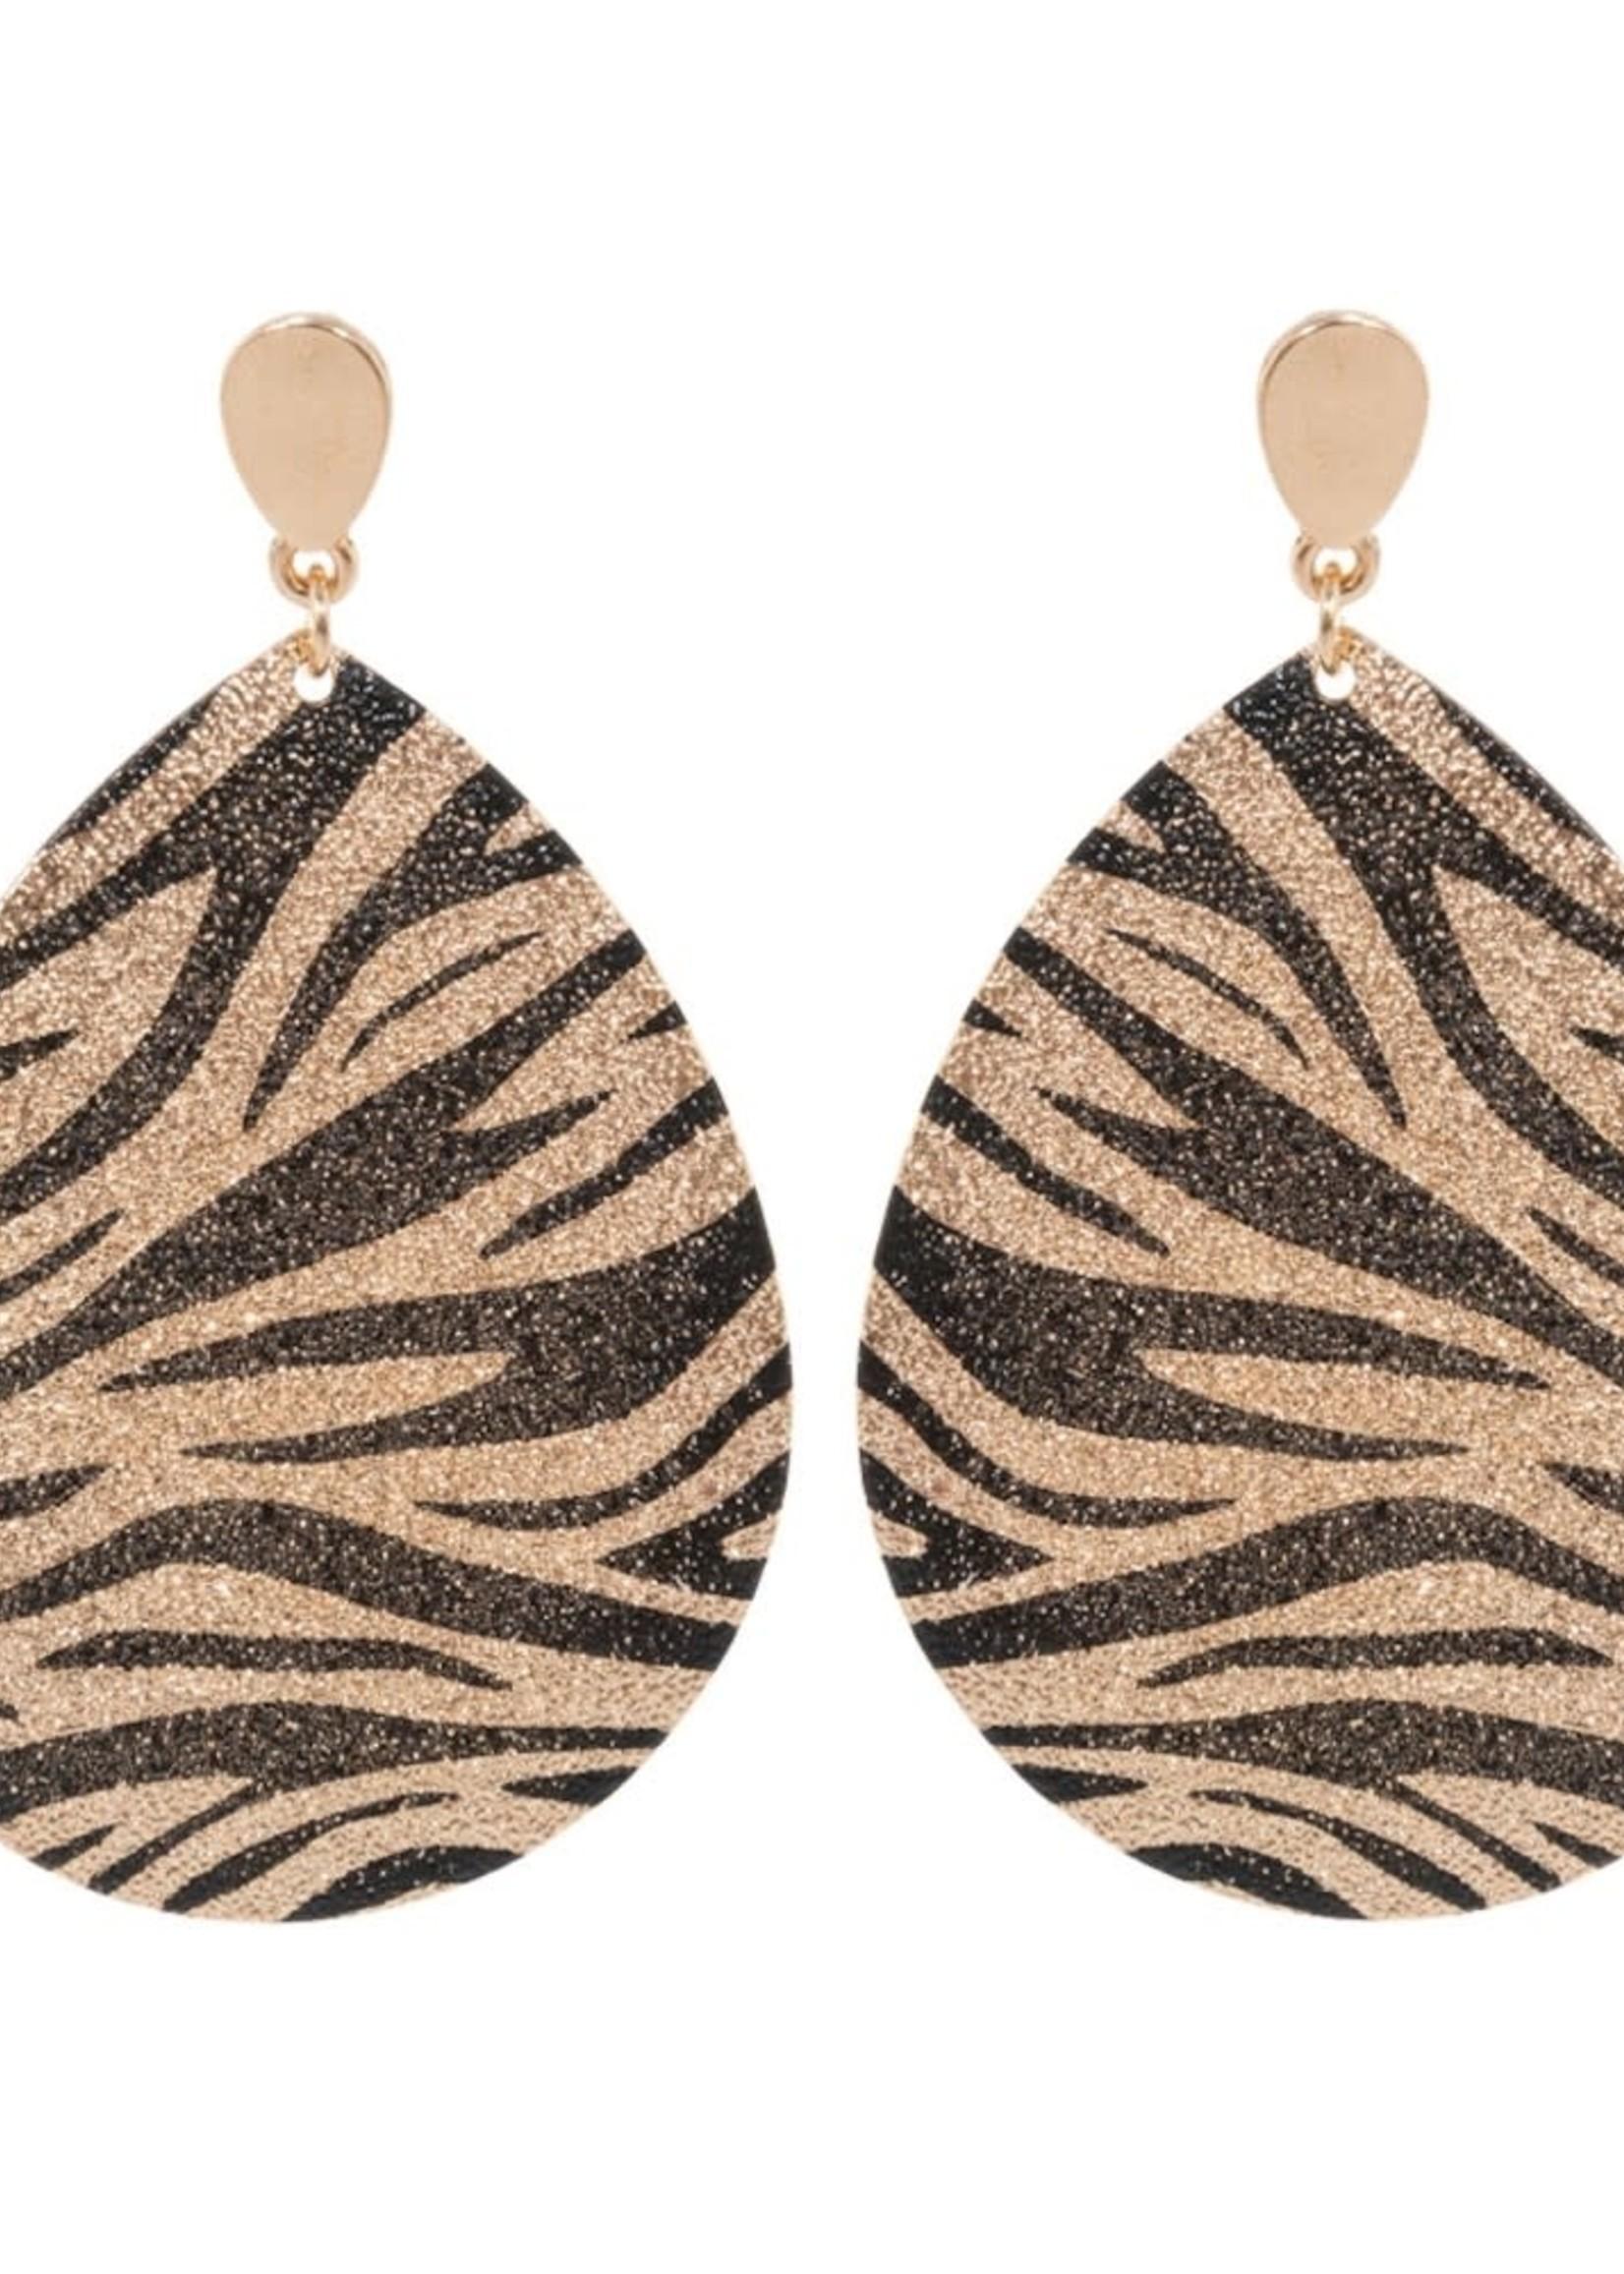 Tiger Print Teardrop Earrings